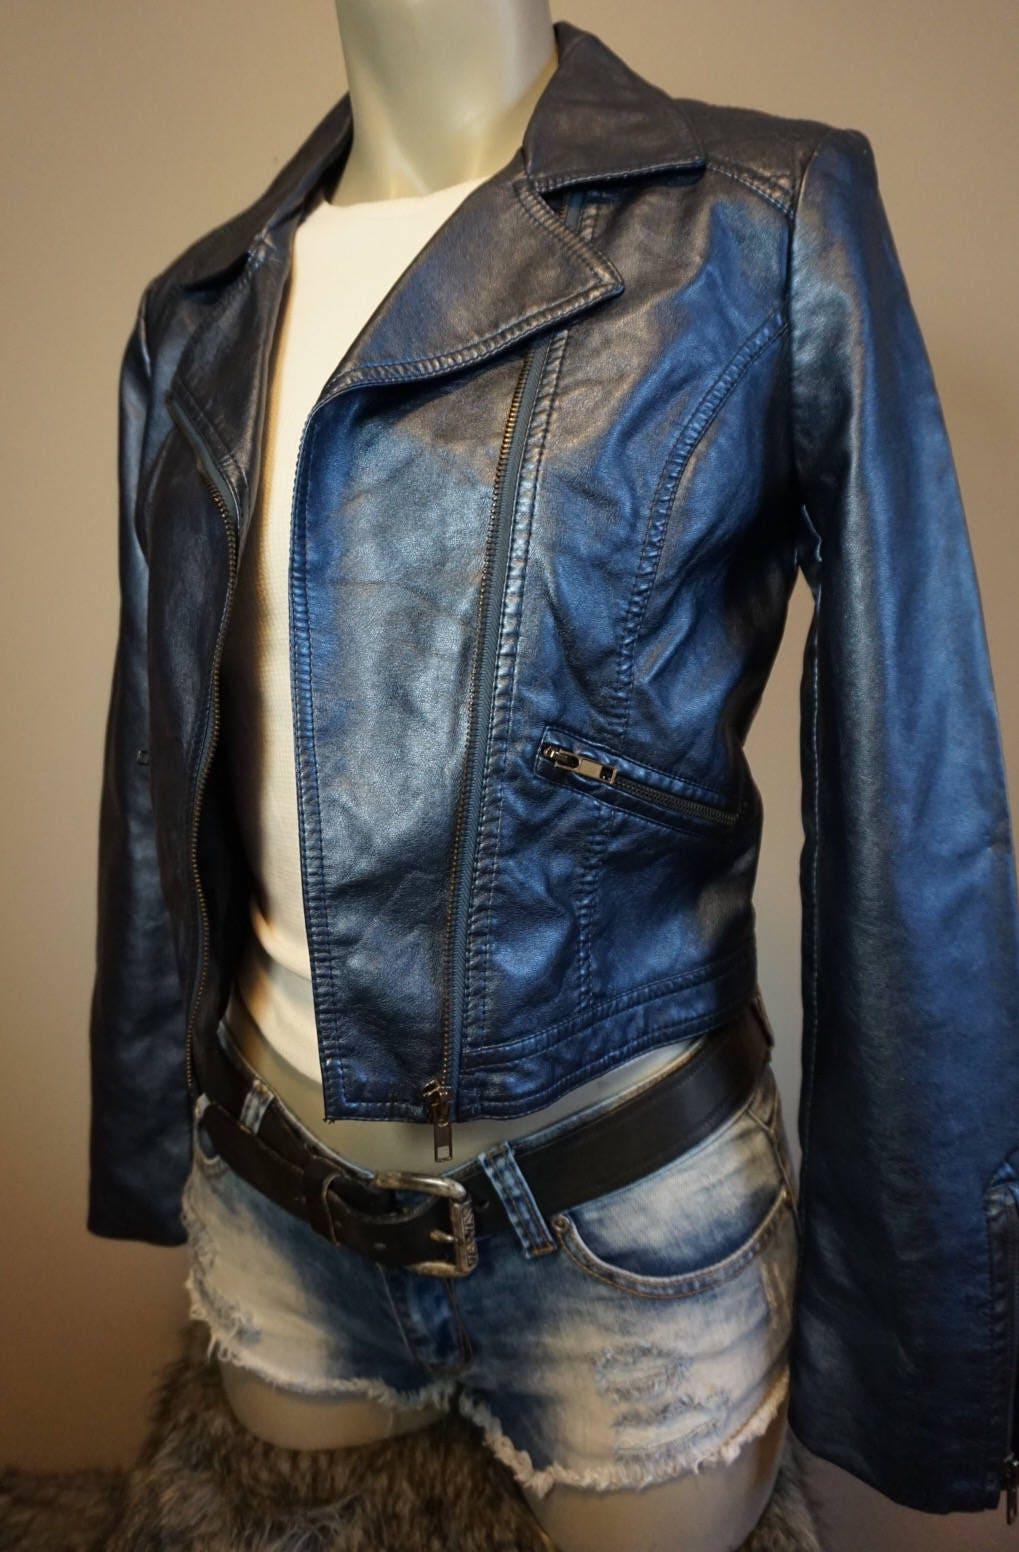 Handpainted Dva Overwatch Vegan Leather Jacket Ooak Etsy Tdr Image 8